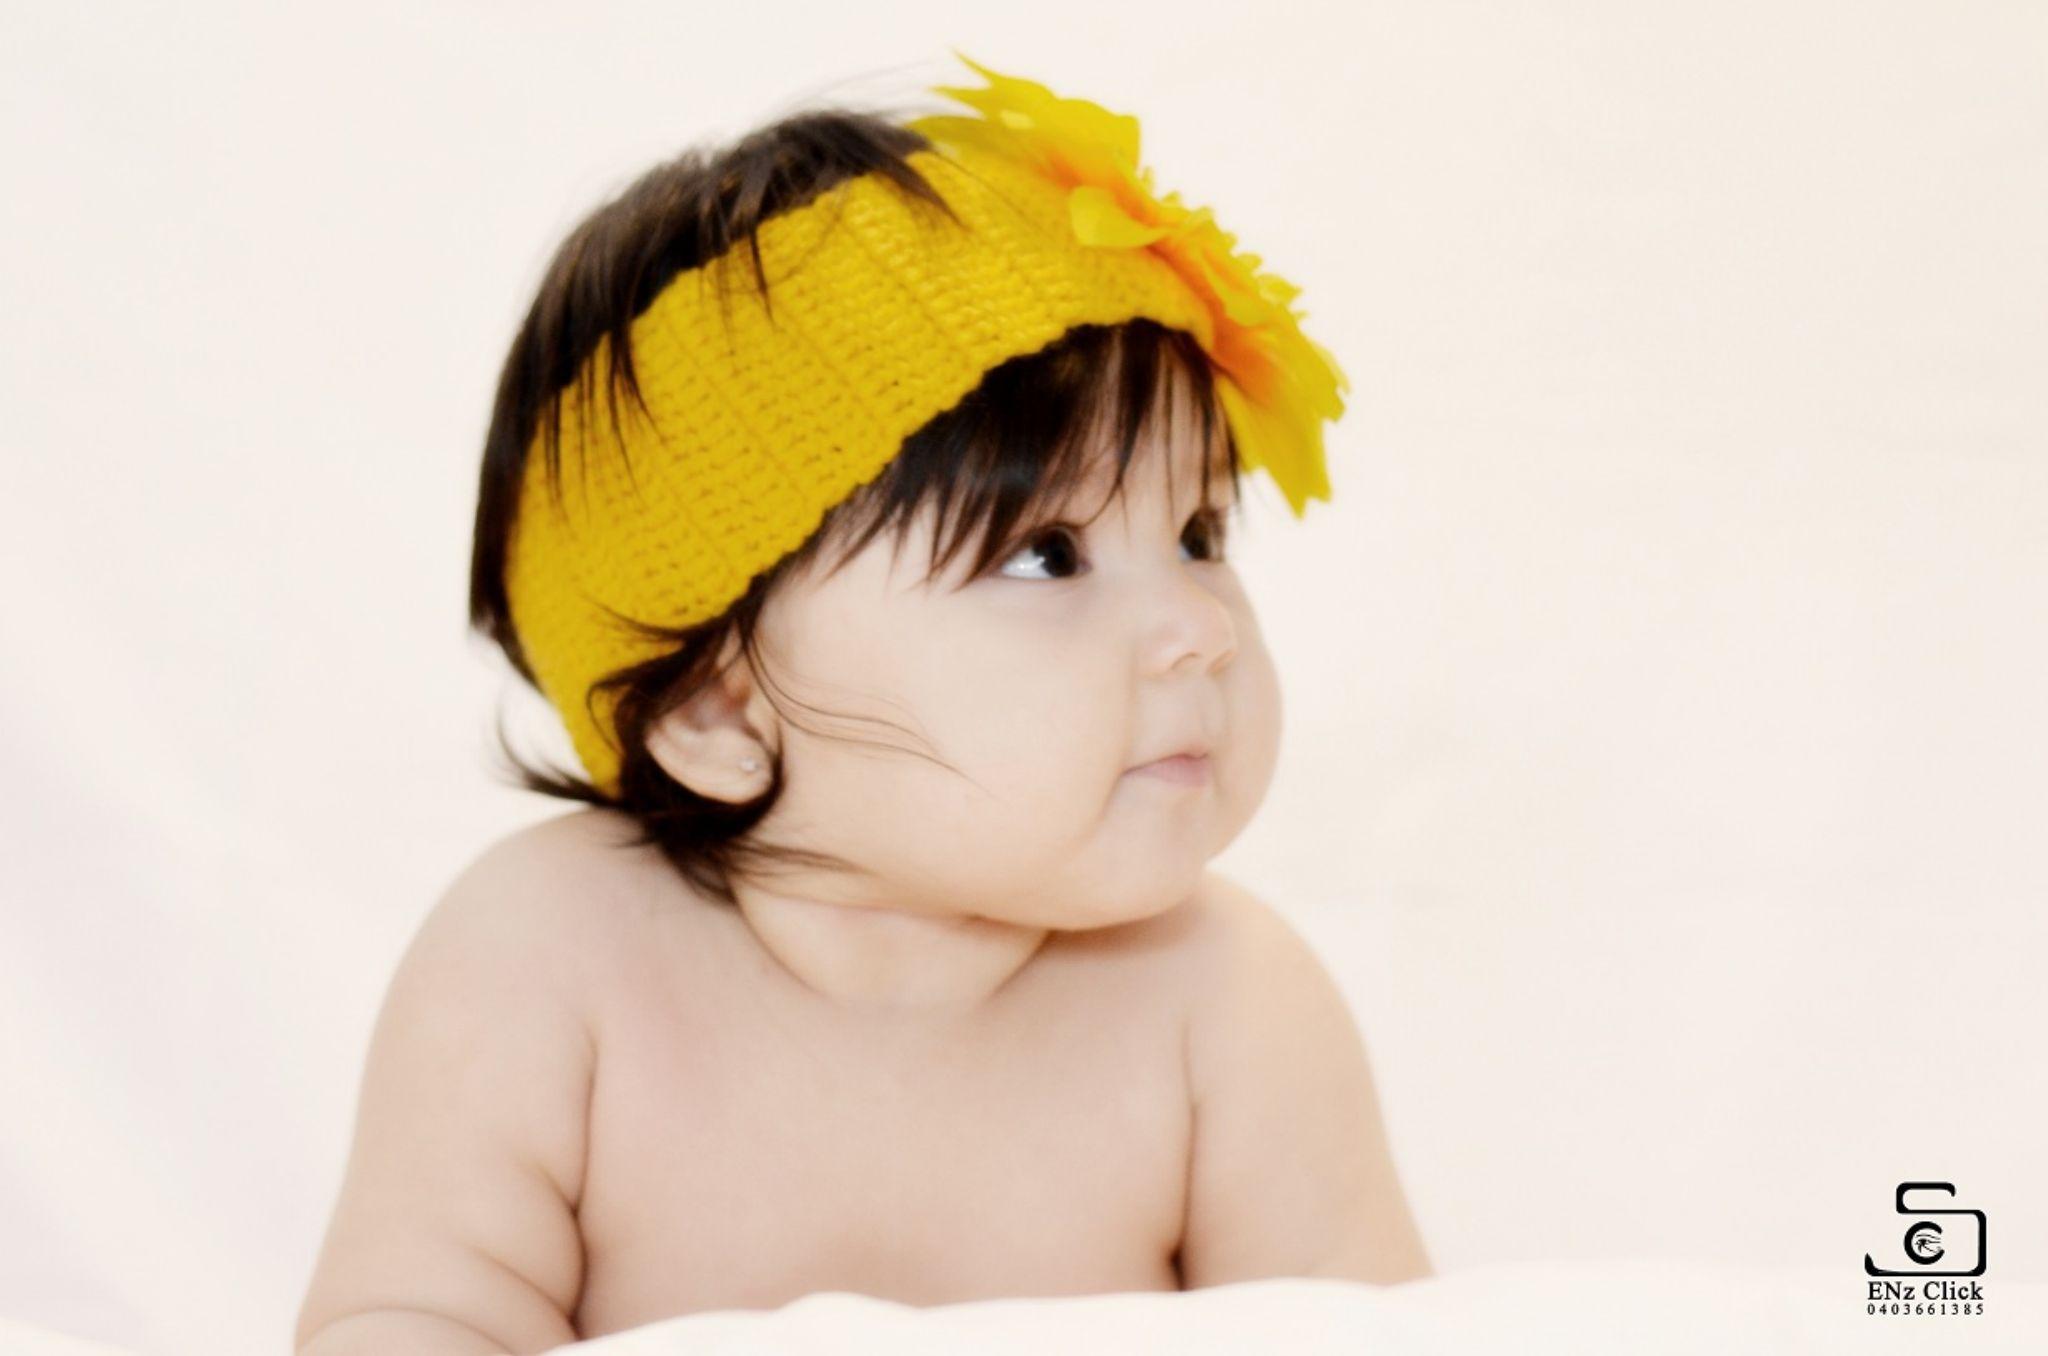 baby by ENz.Auz